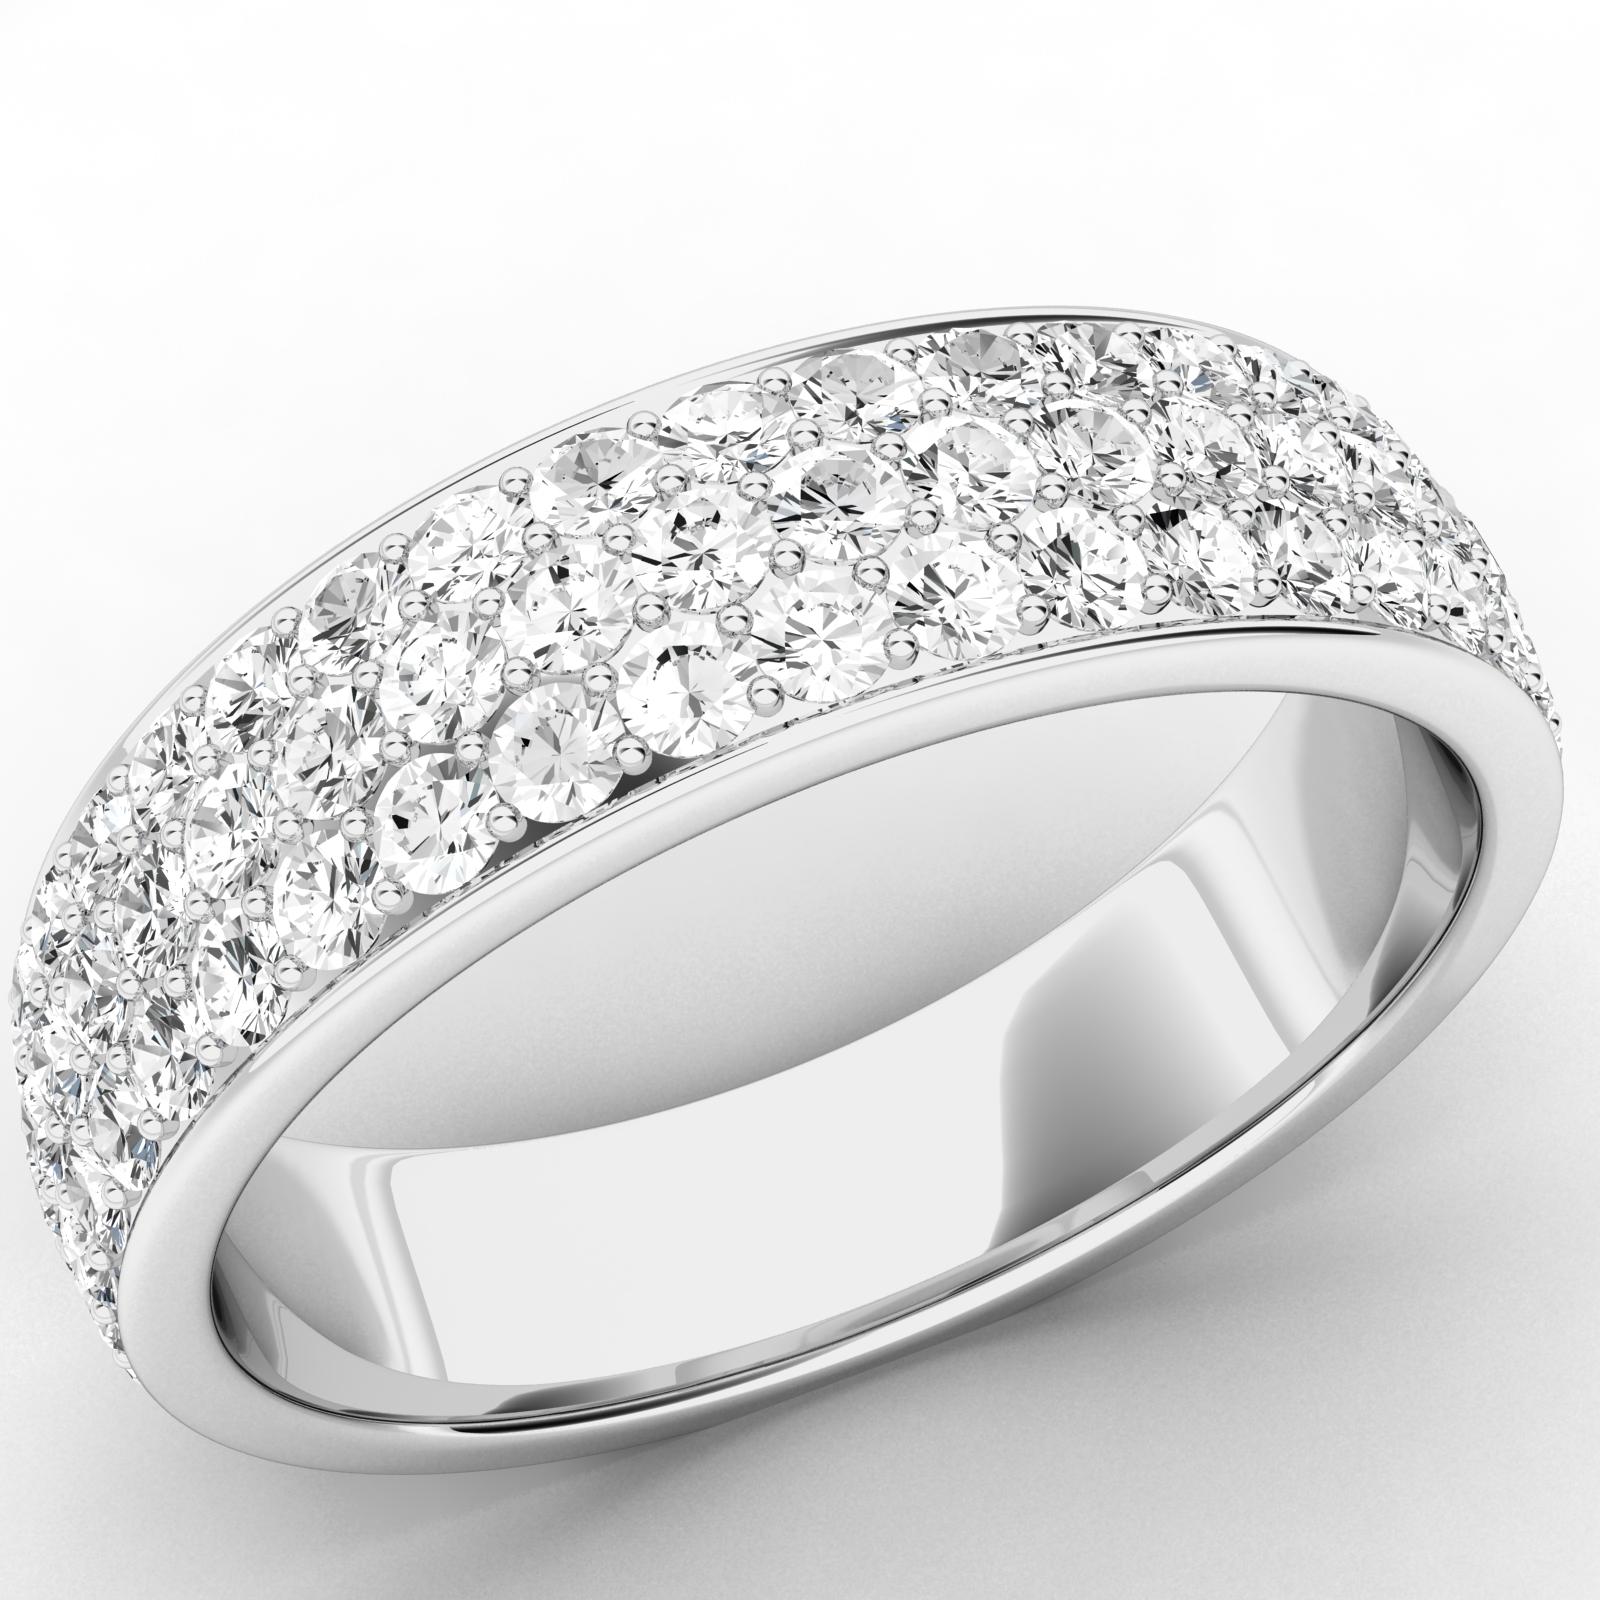 Verigheta cu Diamant/Inel Eternity Dama Platina cu 3 Randuri de Diamante Mici Rotund Briliant in Setare Gheare-img1